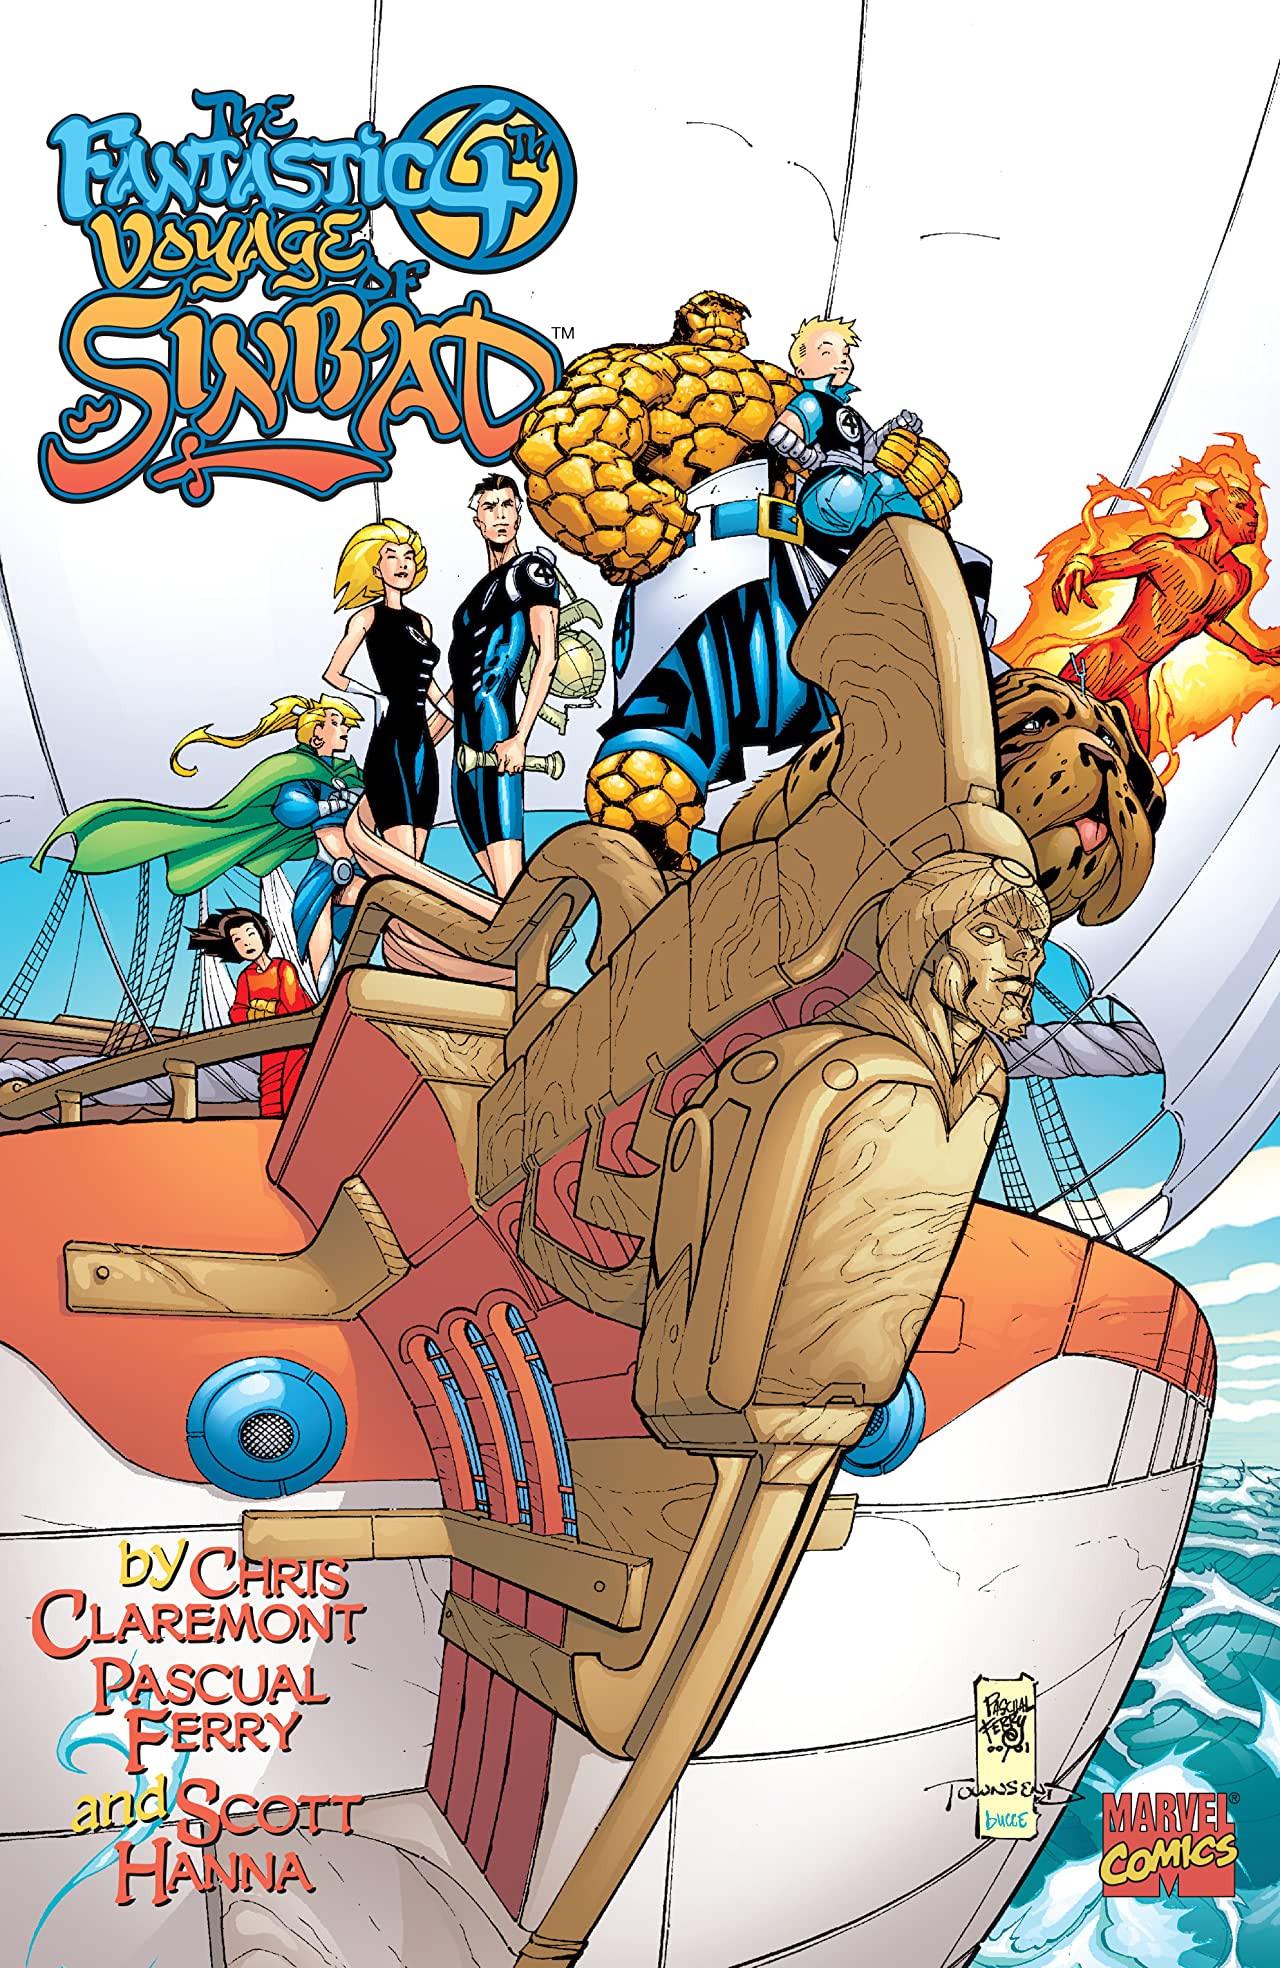 Fantastic 4th Voyage of Sinbad Vol 1 1.jpg